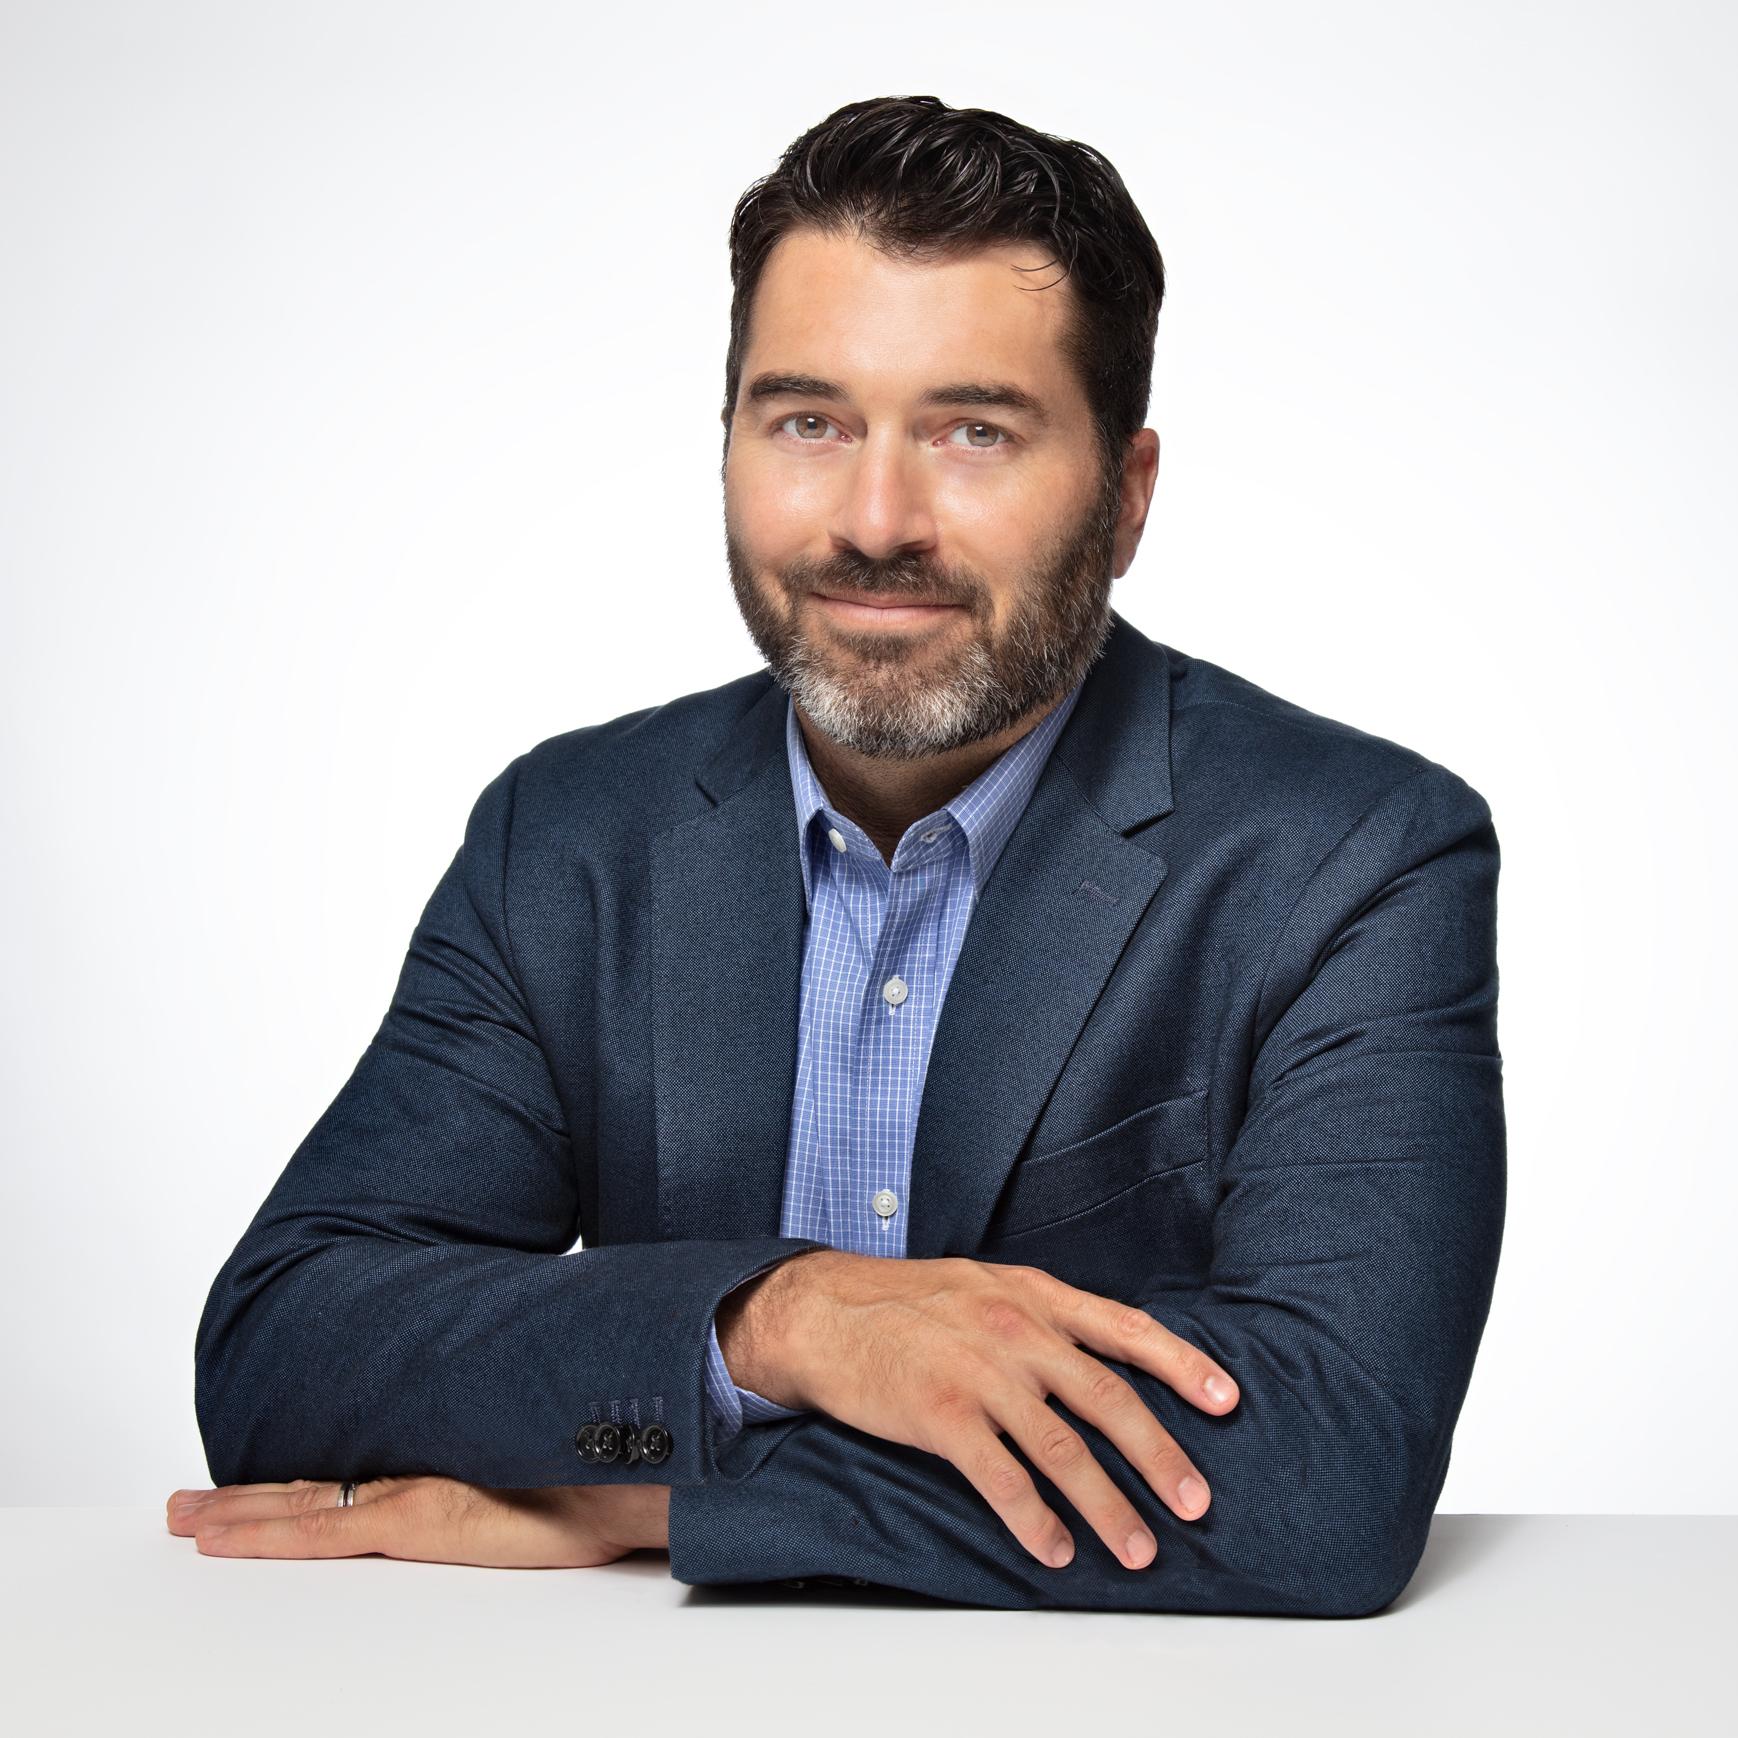 https://pollackpeacebuilding.com/wp-content/uploads/2020/11/Jeremy-Photo-Side-Smile.jpg